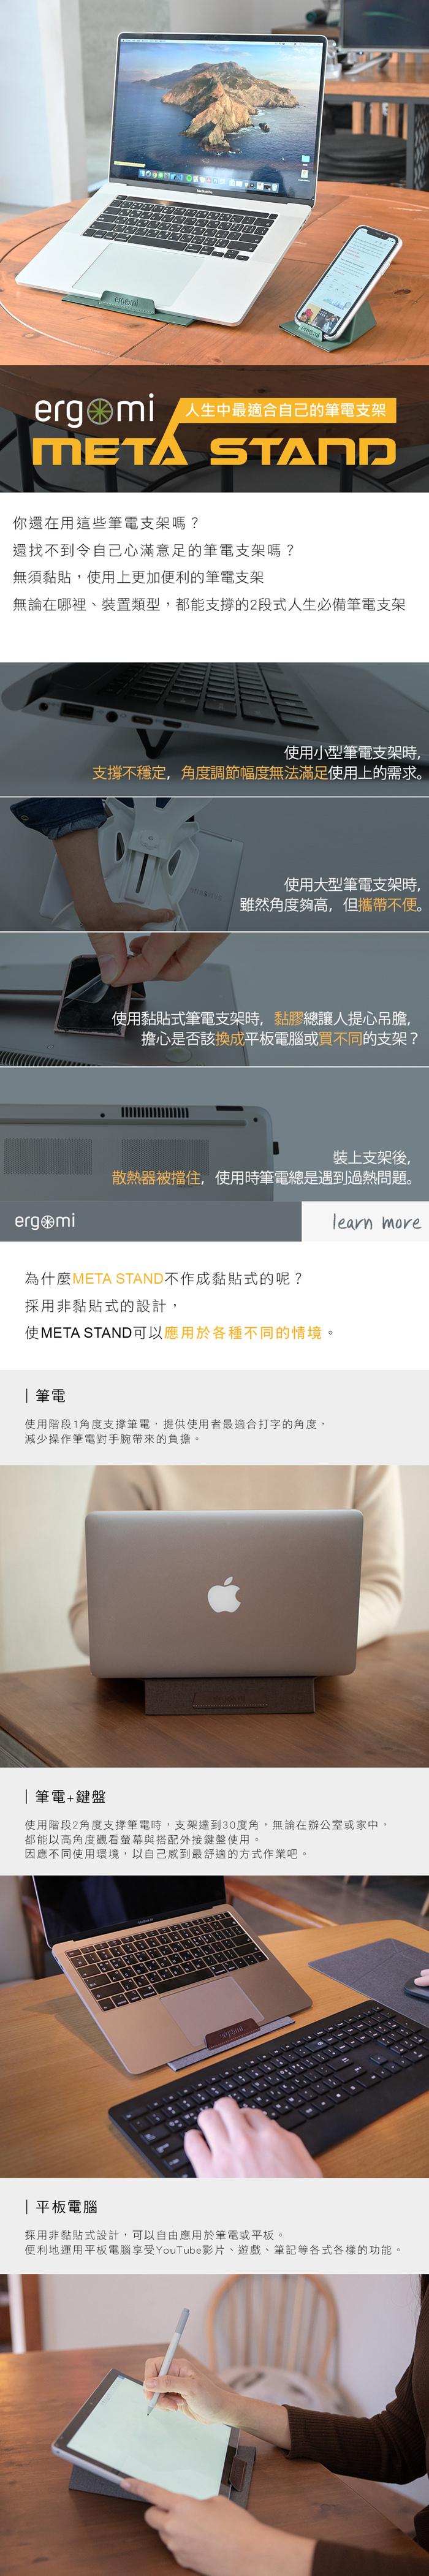 ergomi|Meta Stand 筆電支架